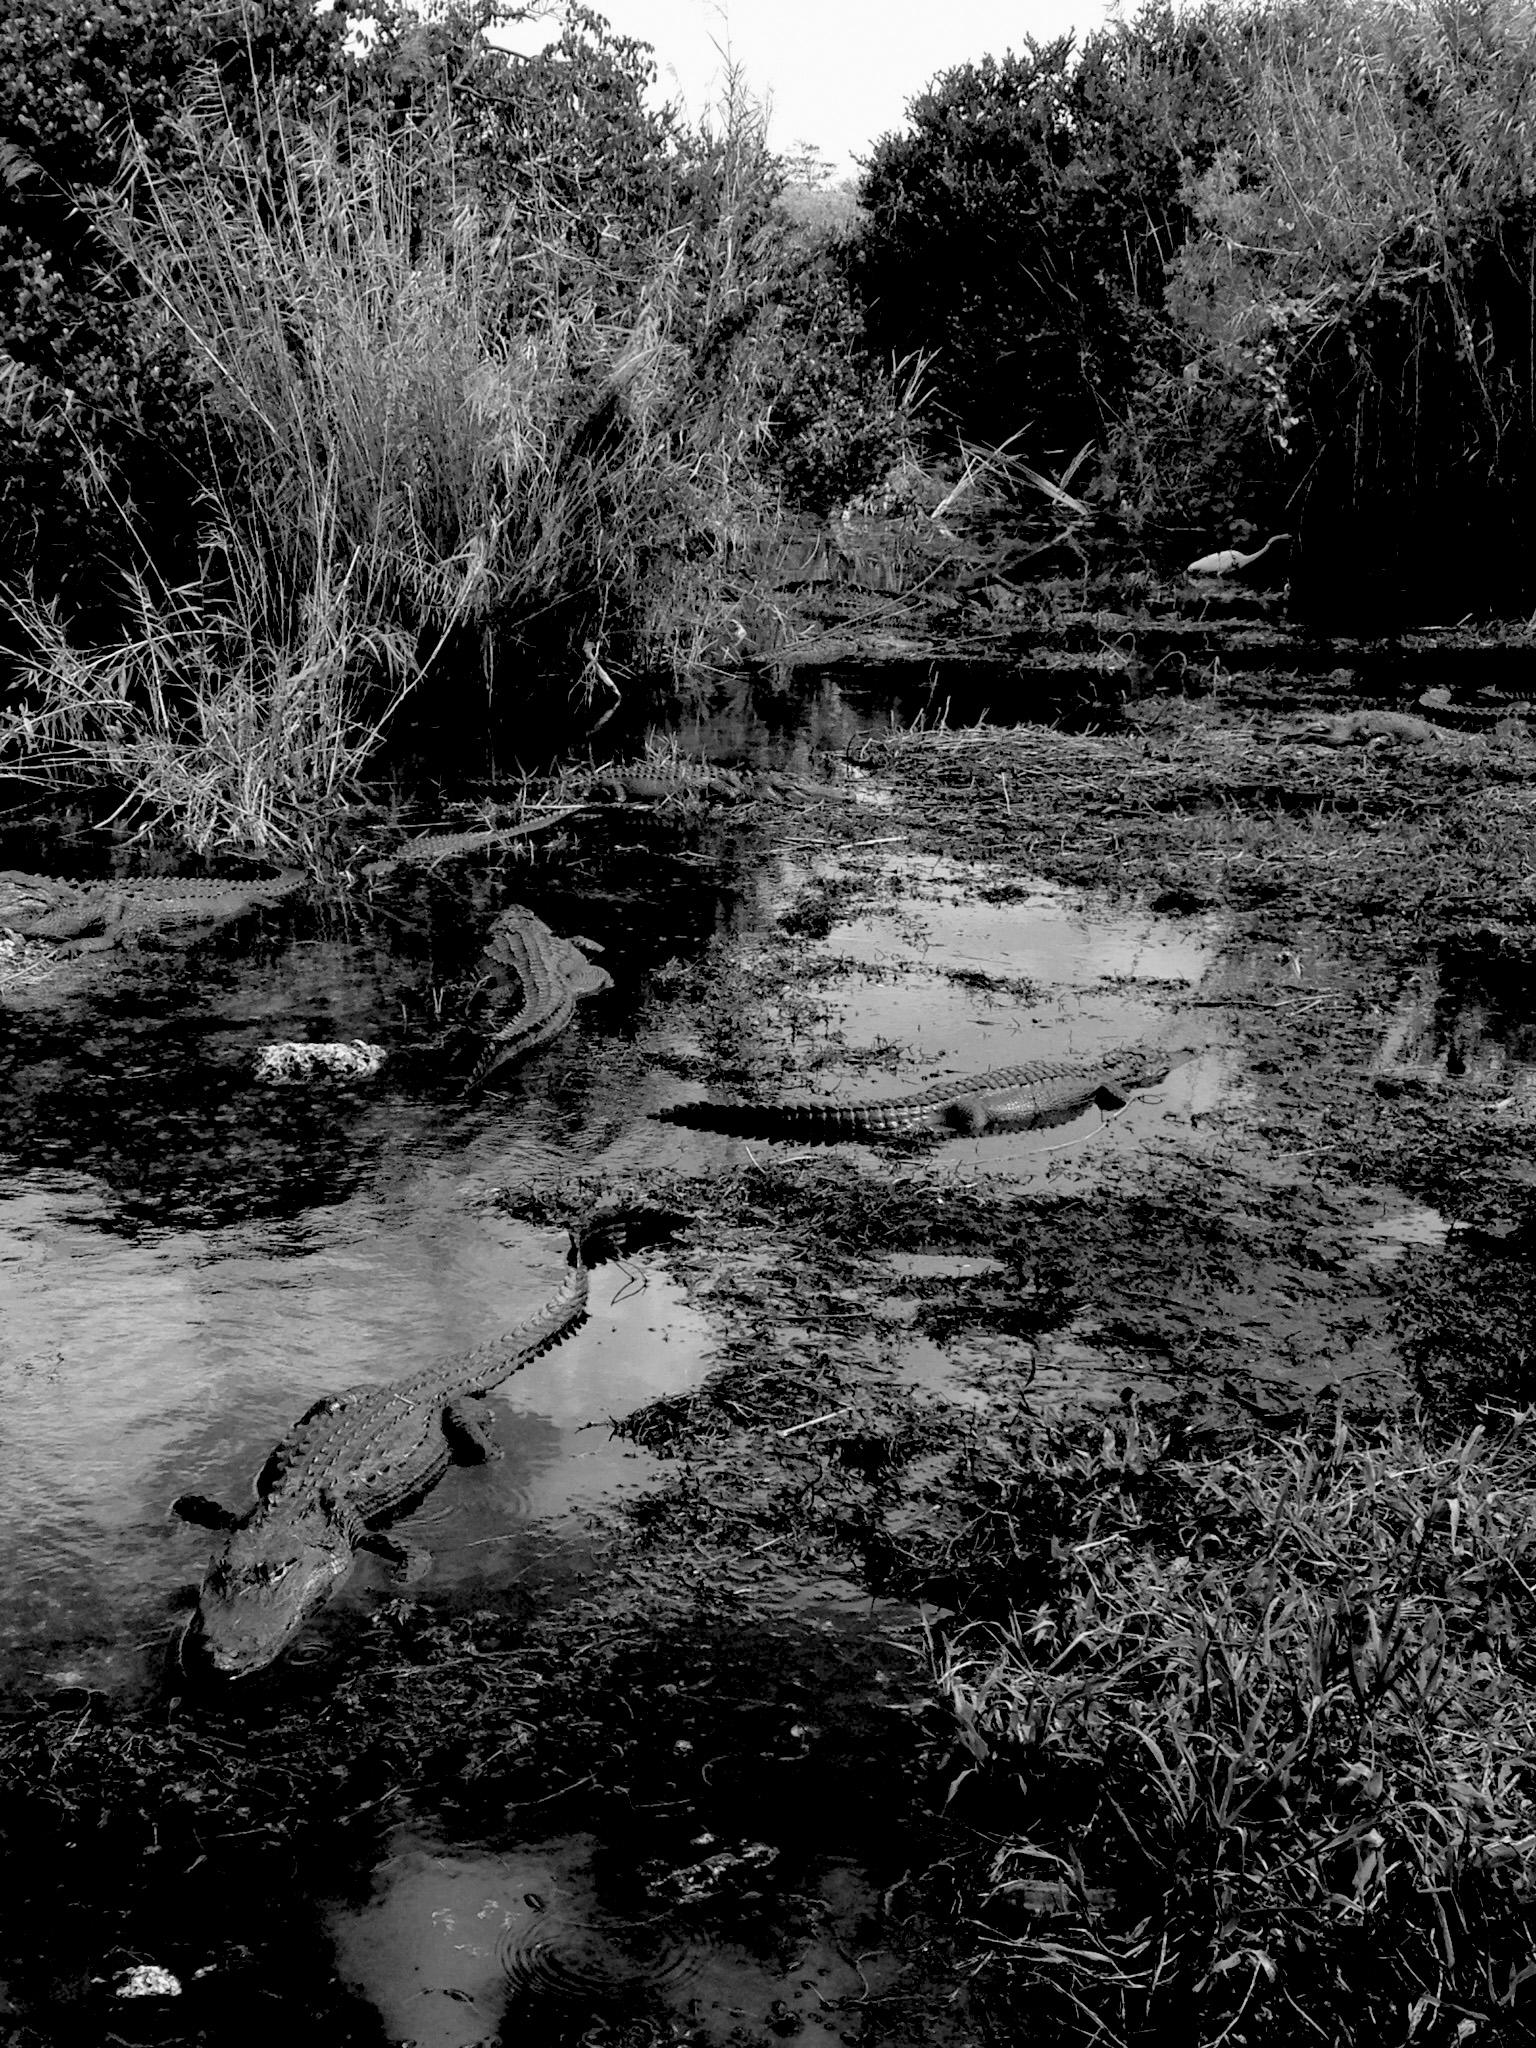 Alligators in Everglades National Park, Florida / Darker than Green